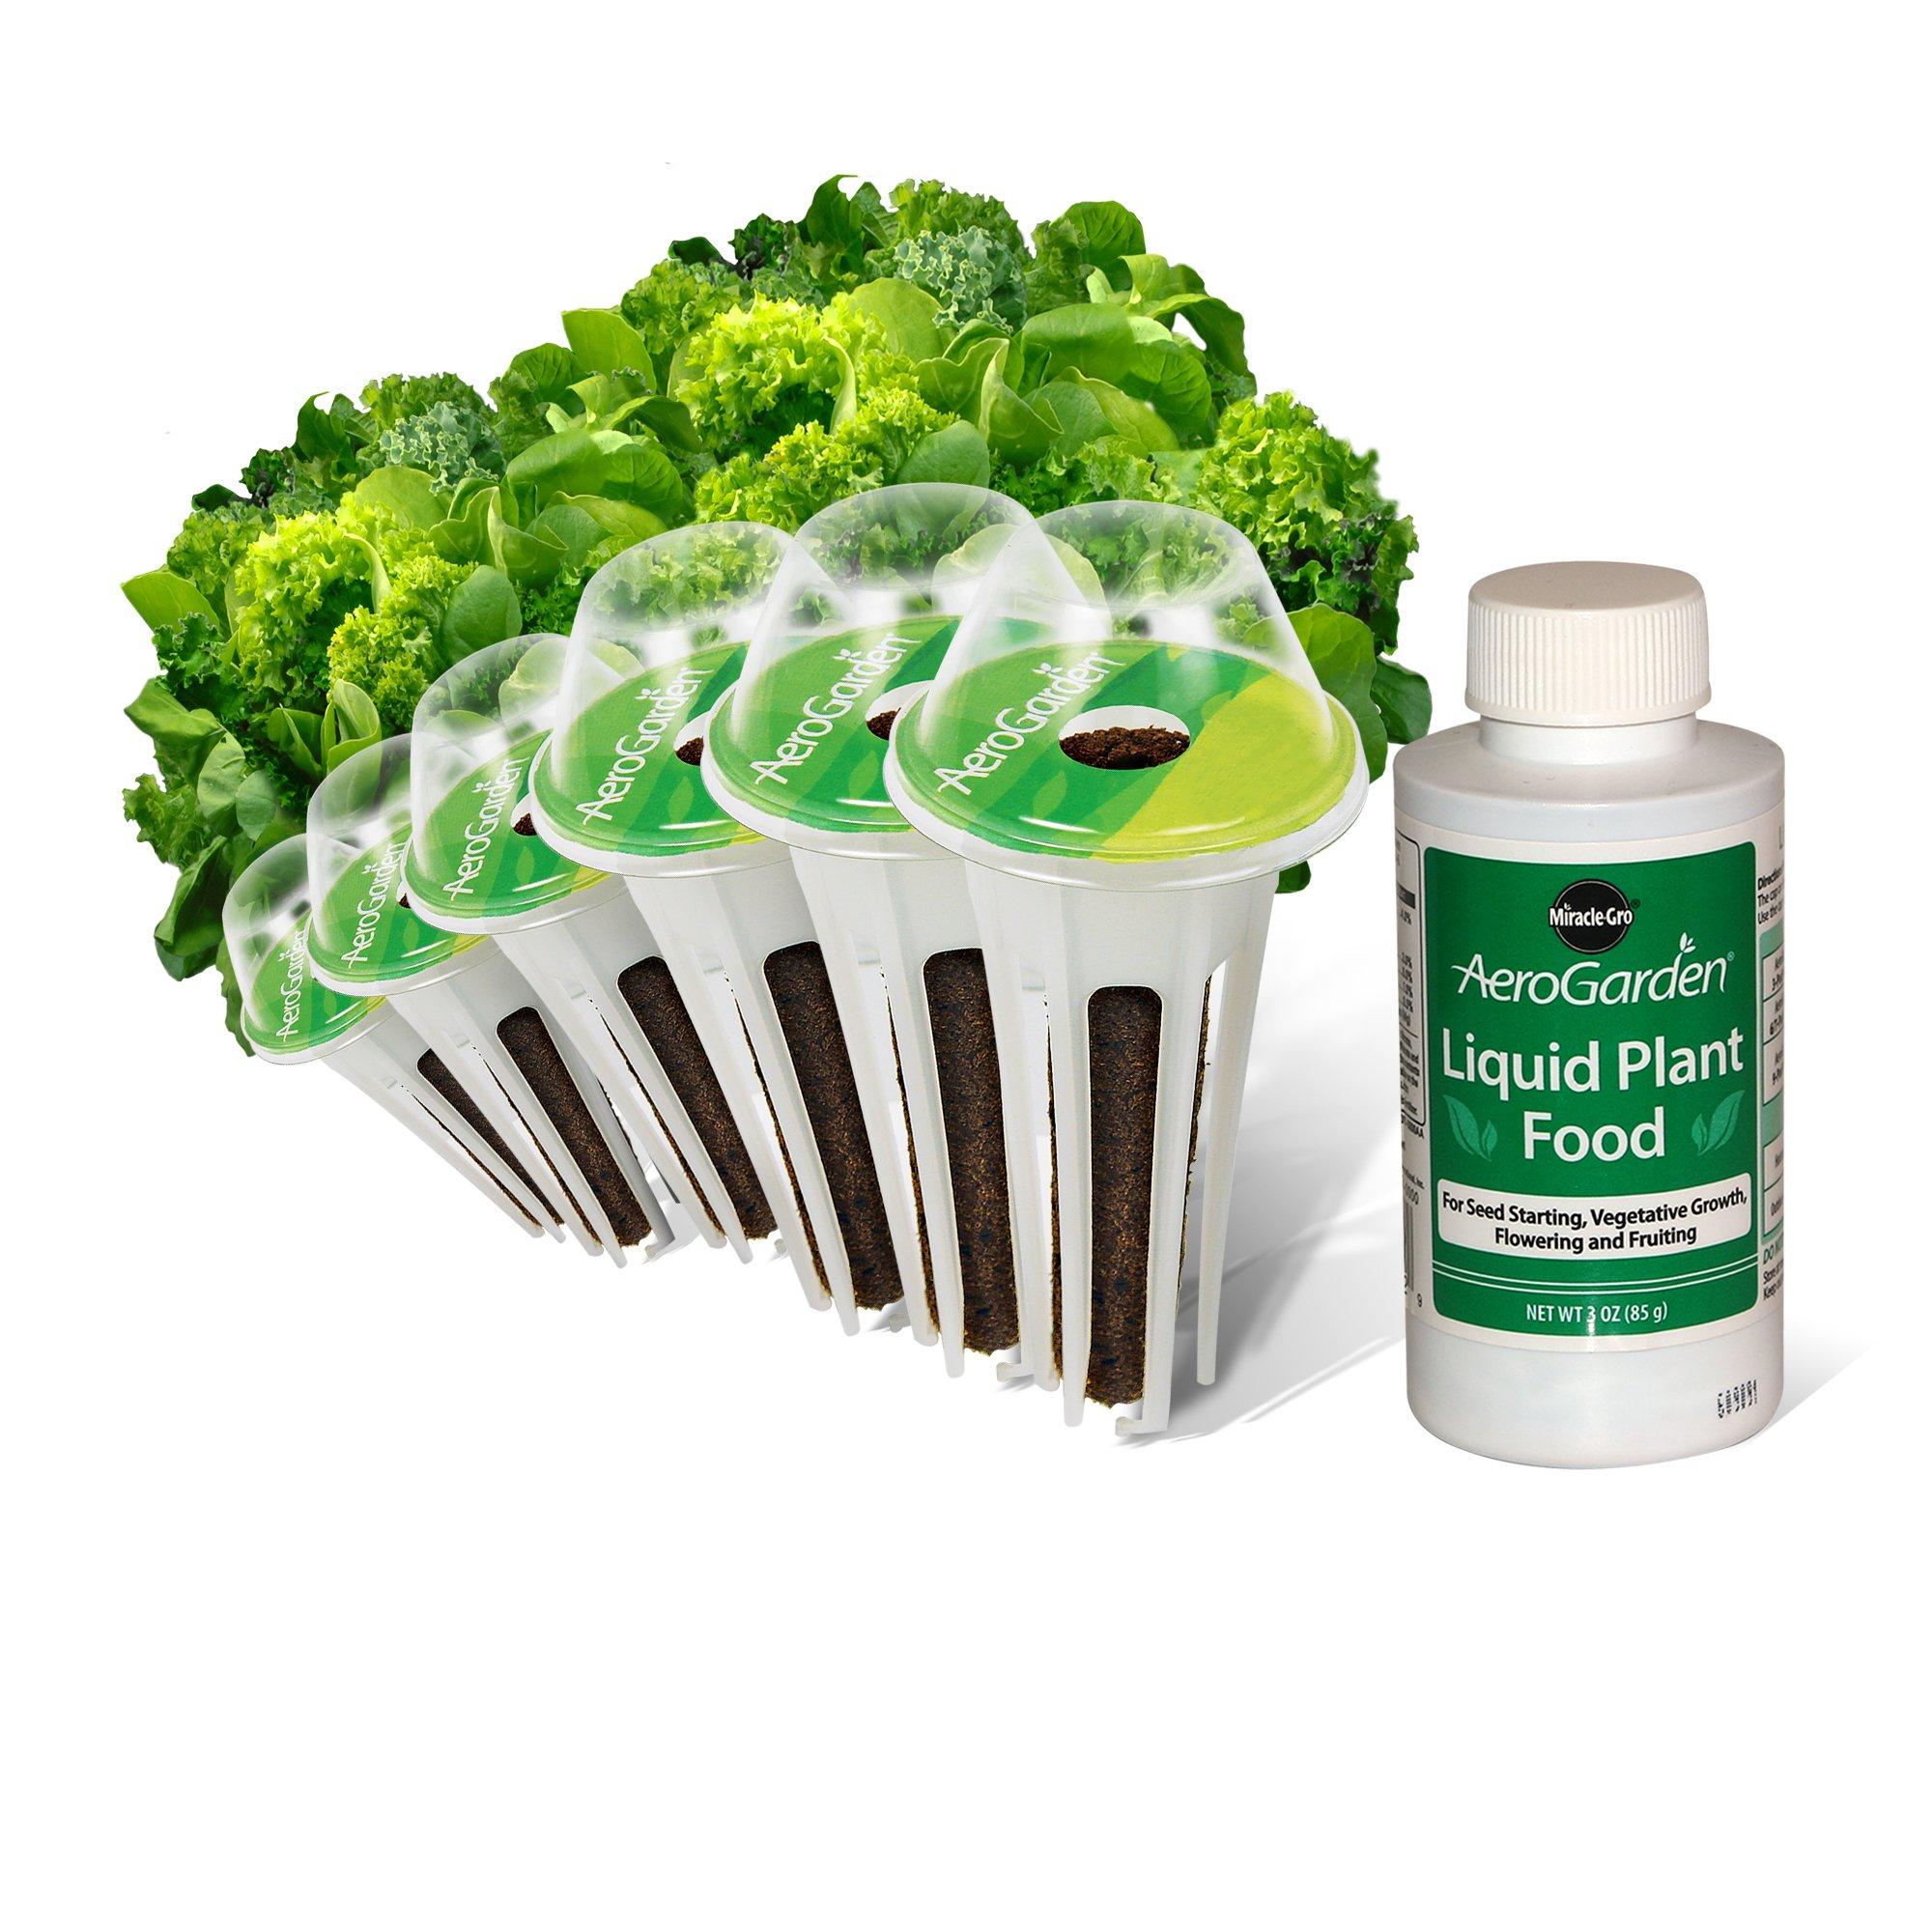 AeroGarden Heirloom Salad Greens Seed Kit (6 pod) by AeroGarden